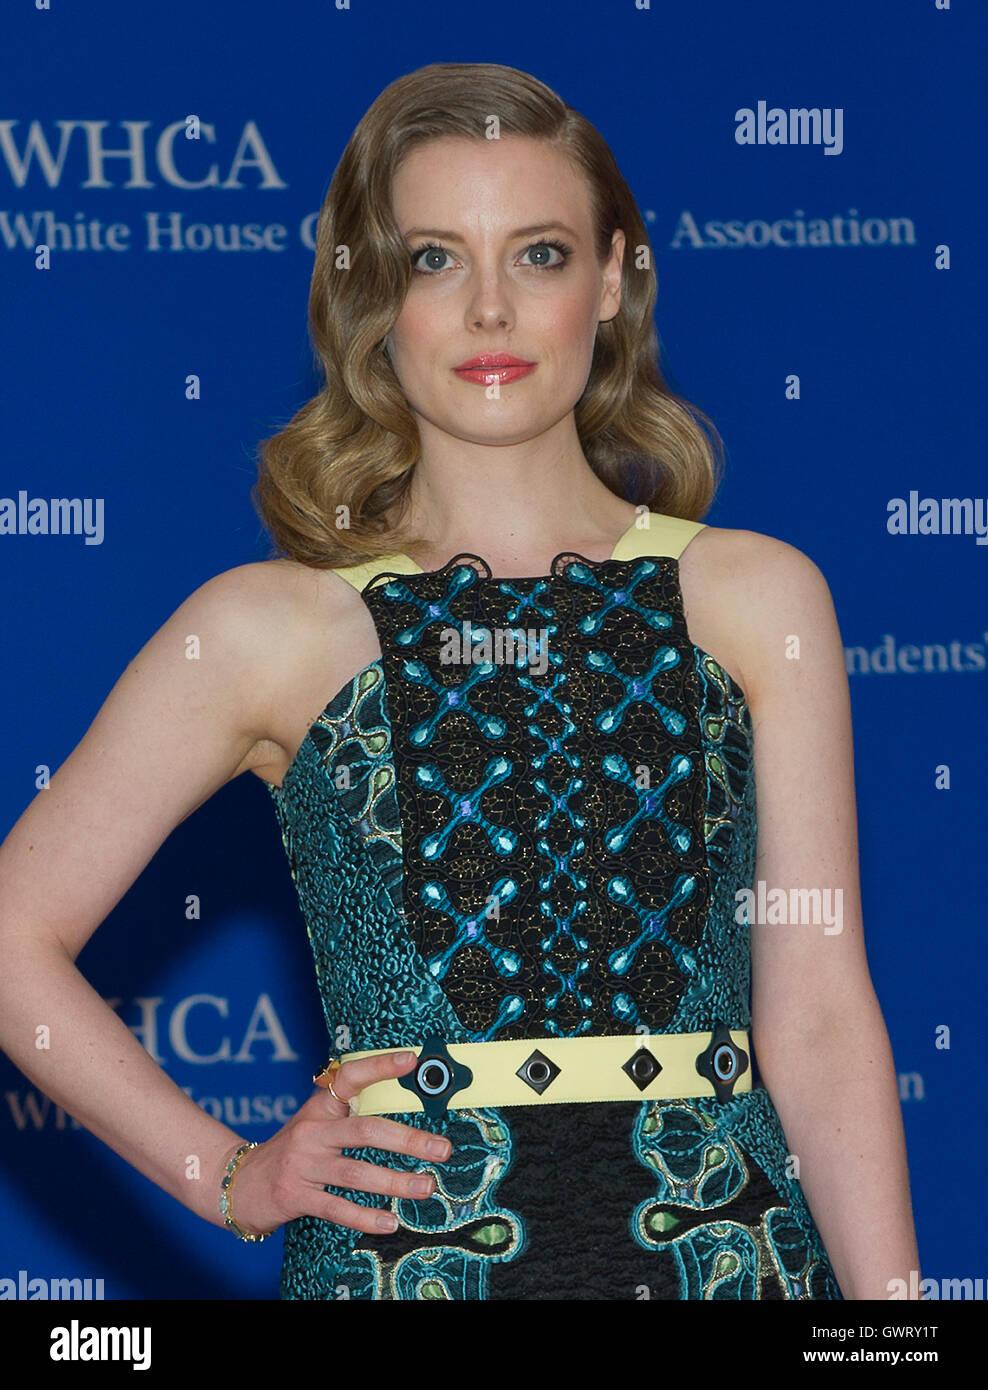 Gillian Jacobs arrives for the 2015 White House Correspondents Association Annual Dinner at the Washington Hilton Stock Photo